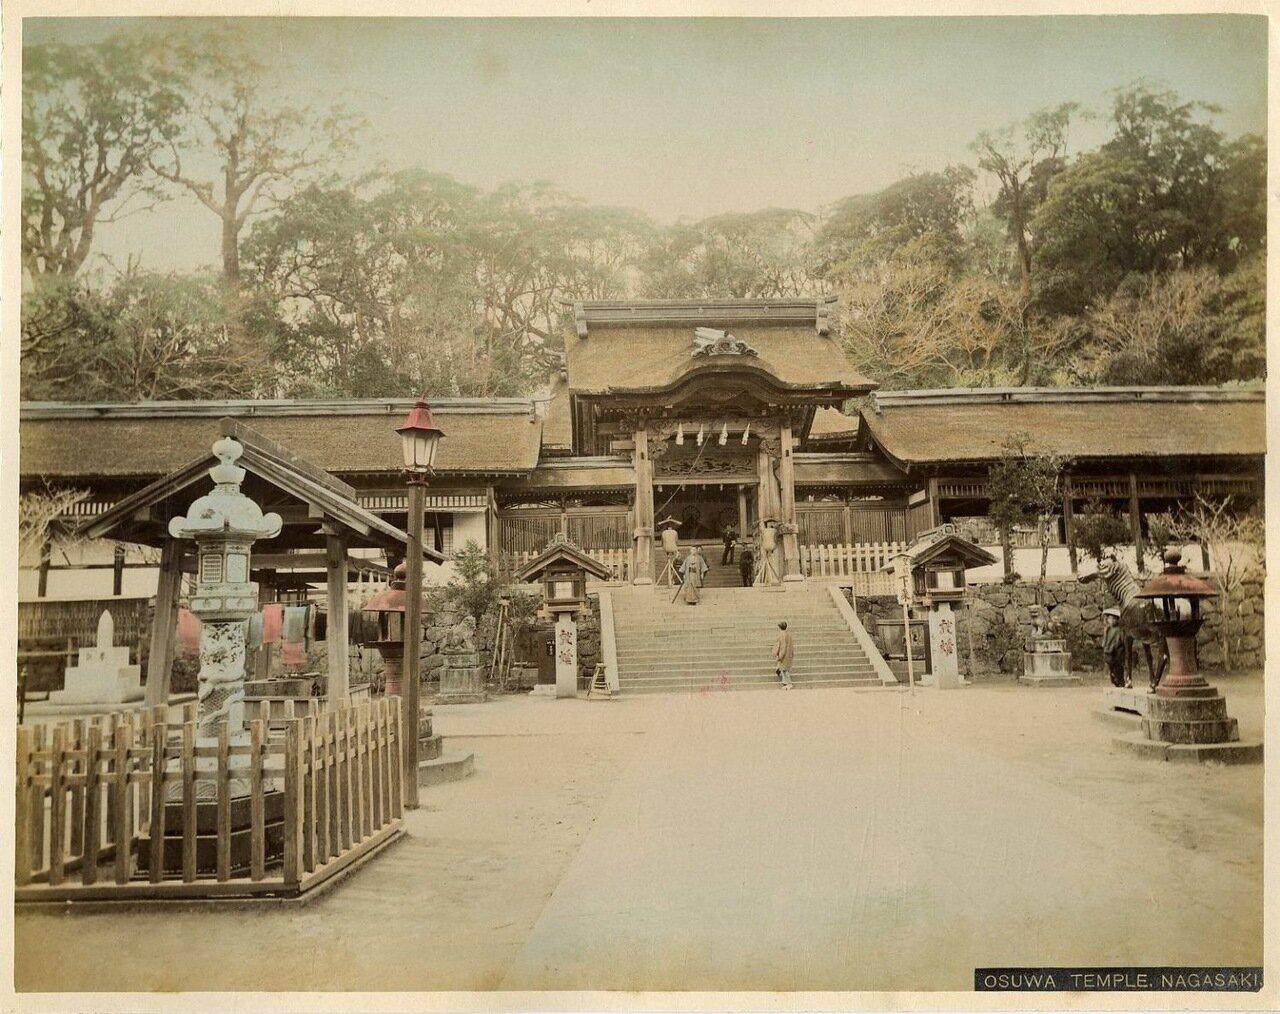 Нагасаки. Храм Осува